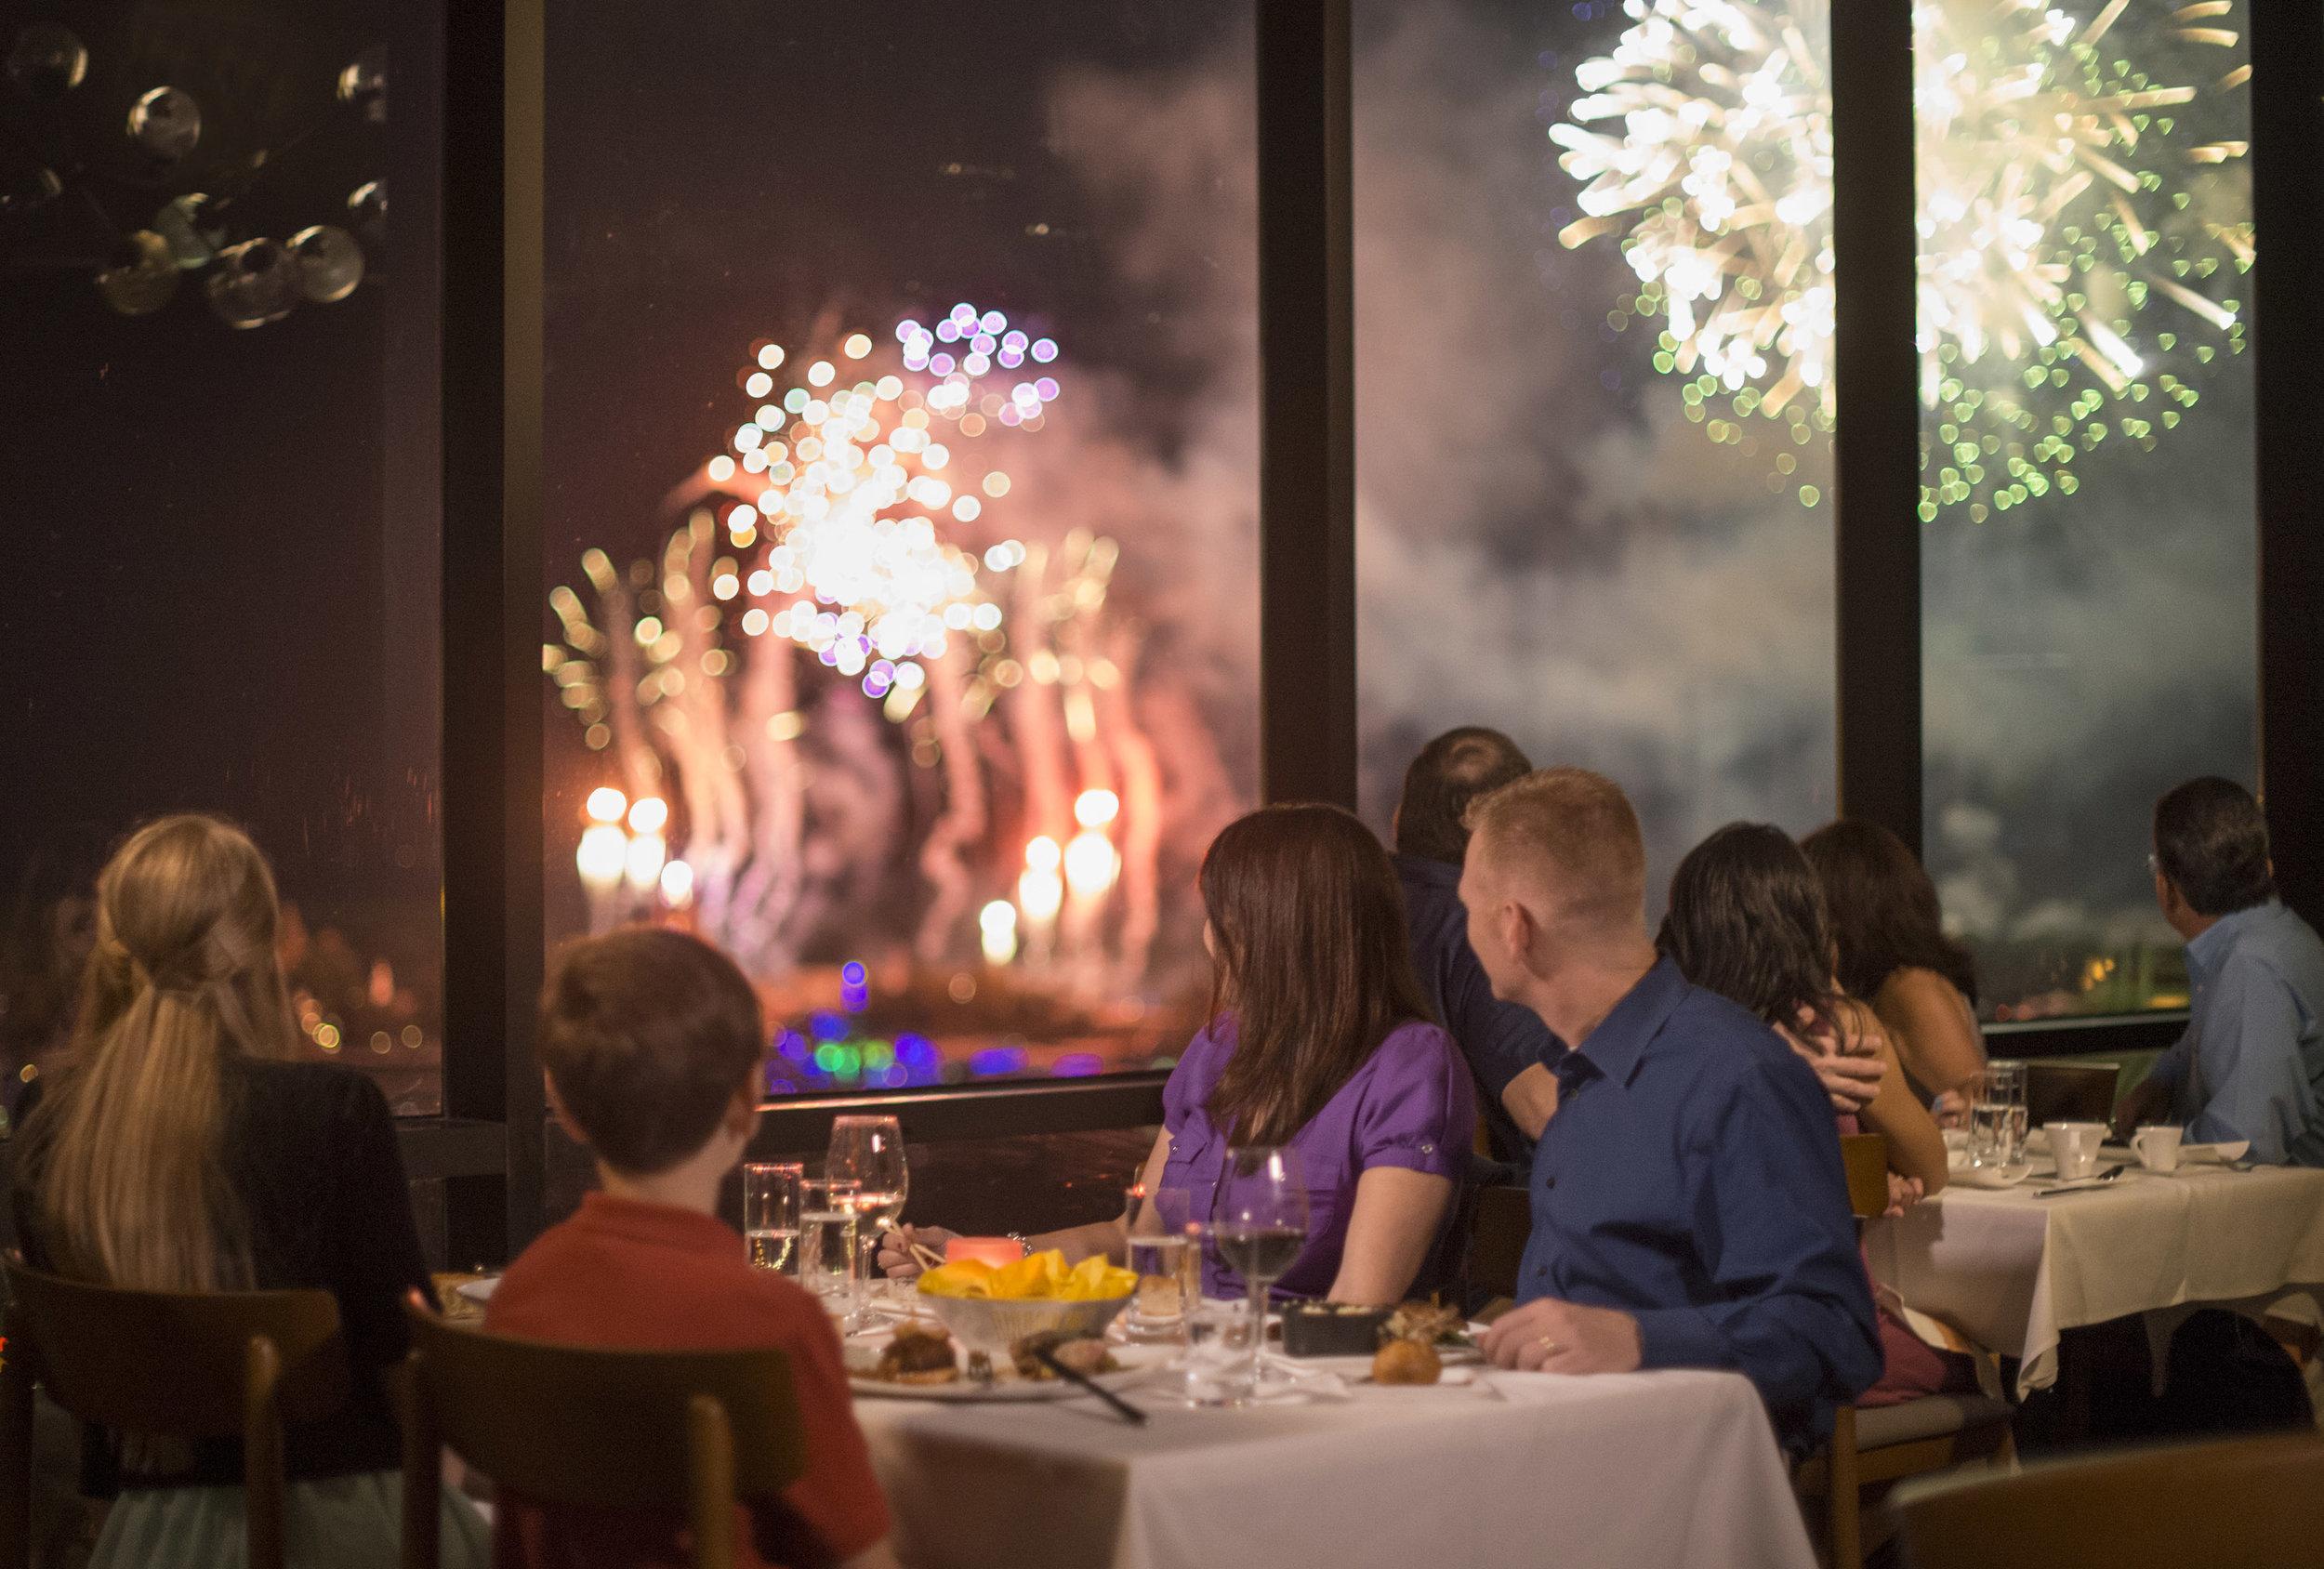 Best Restaurants at Walt Disney World - California Grill